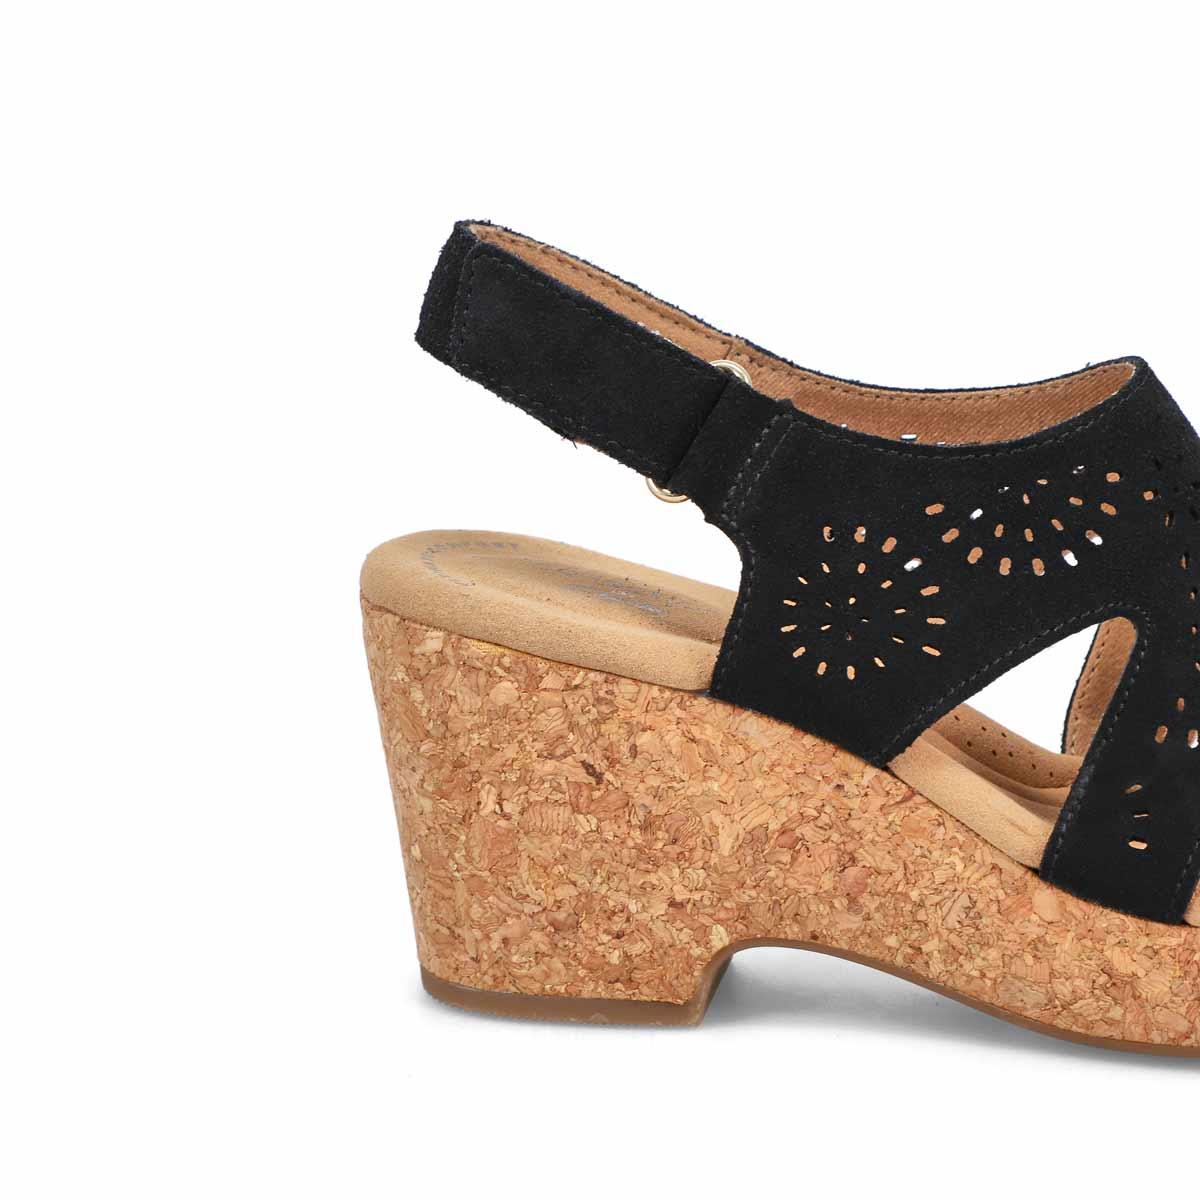 Women's Giselle Bay Wedge Sandal - Black/ Wide